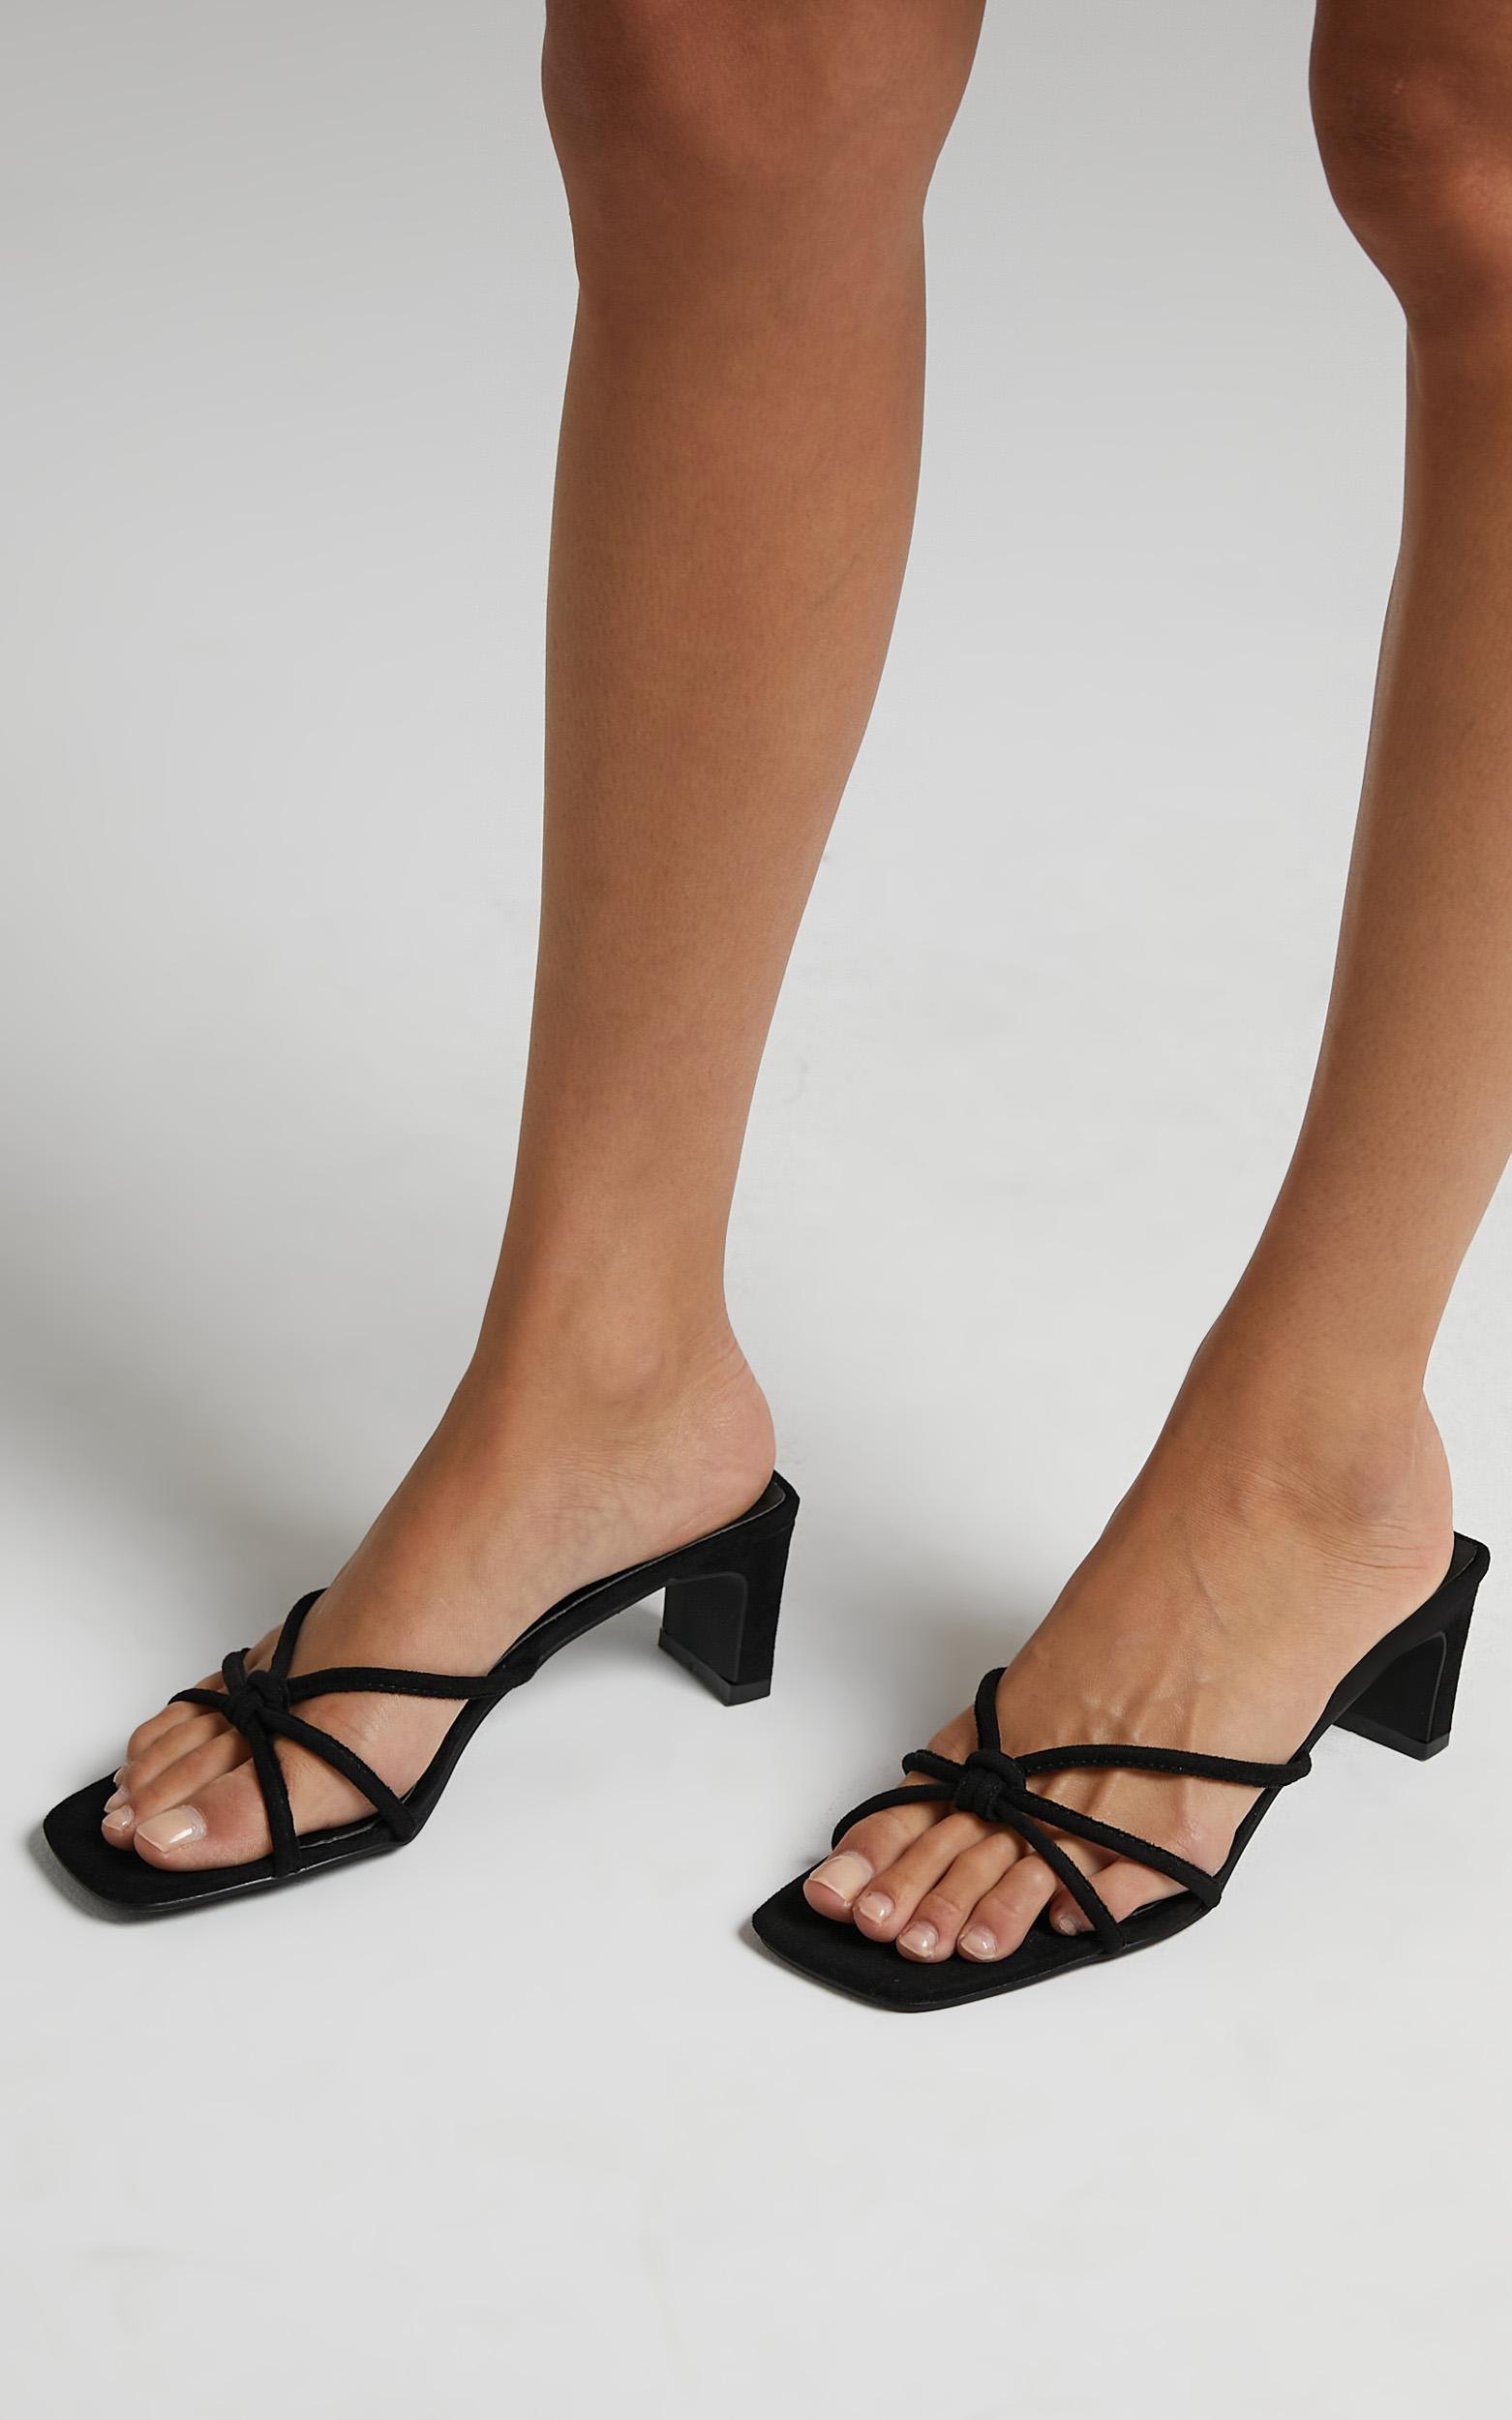 Billini - Grace Heels in Black - 5, Black, hi-res image number null